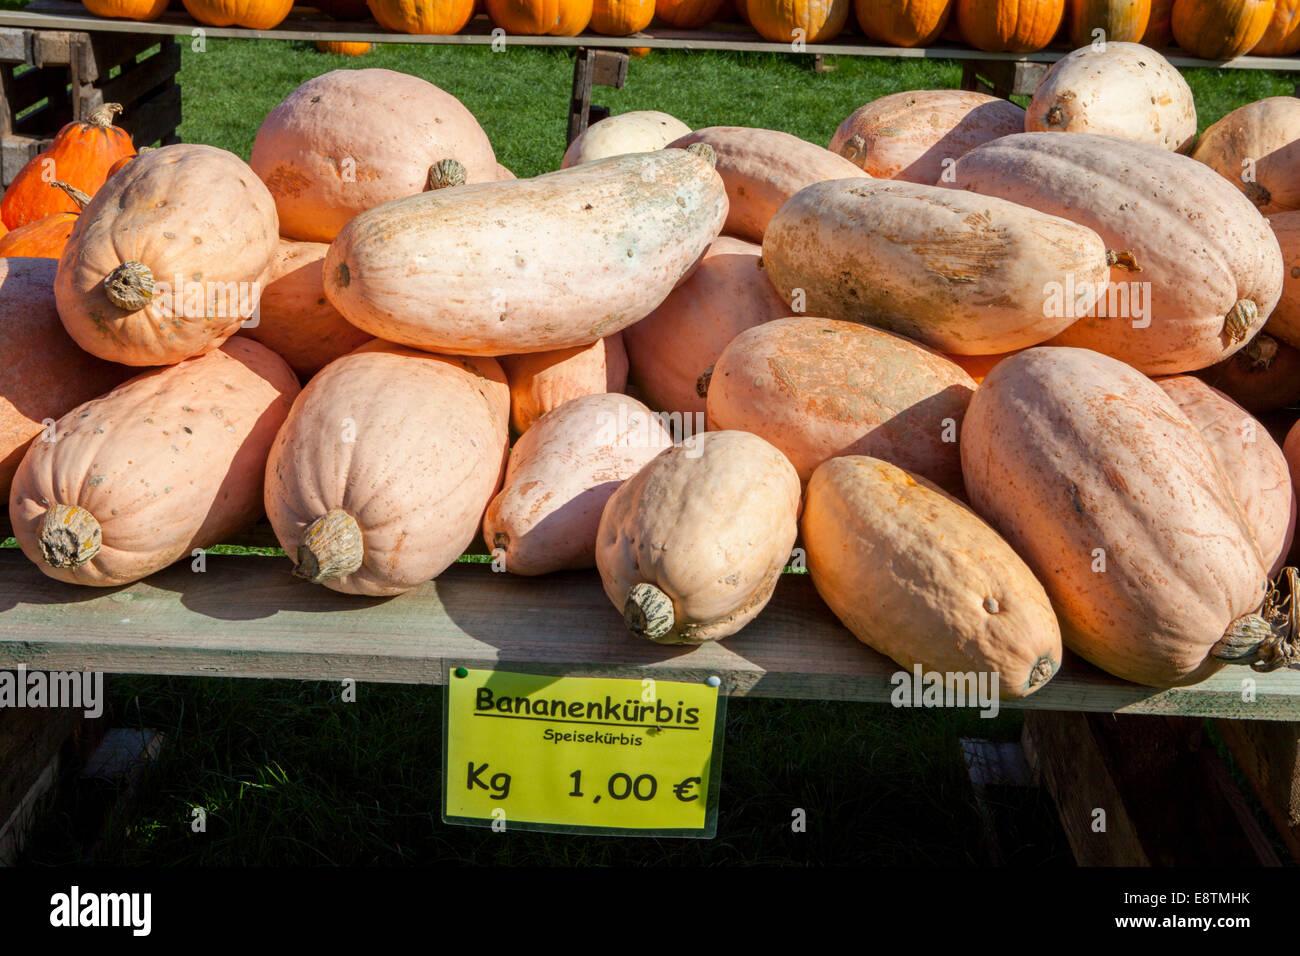 Banana Squash, Immagini Stock